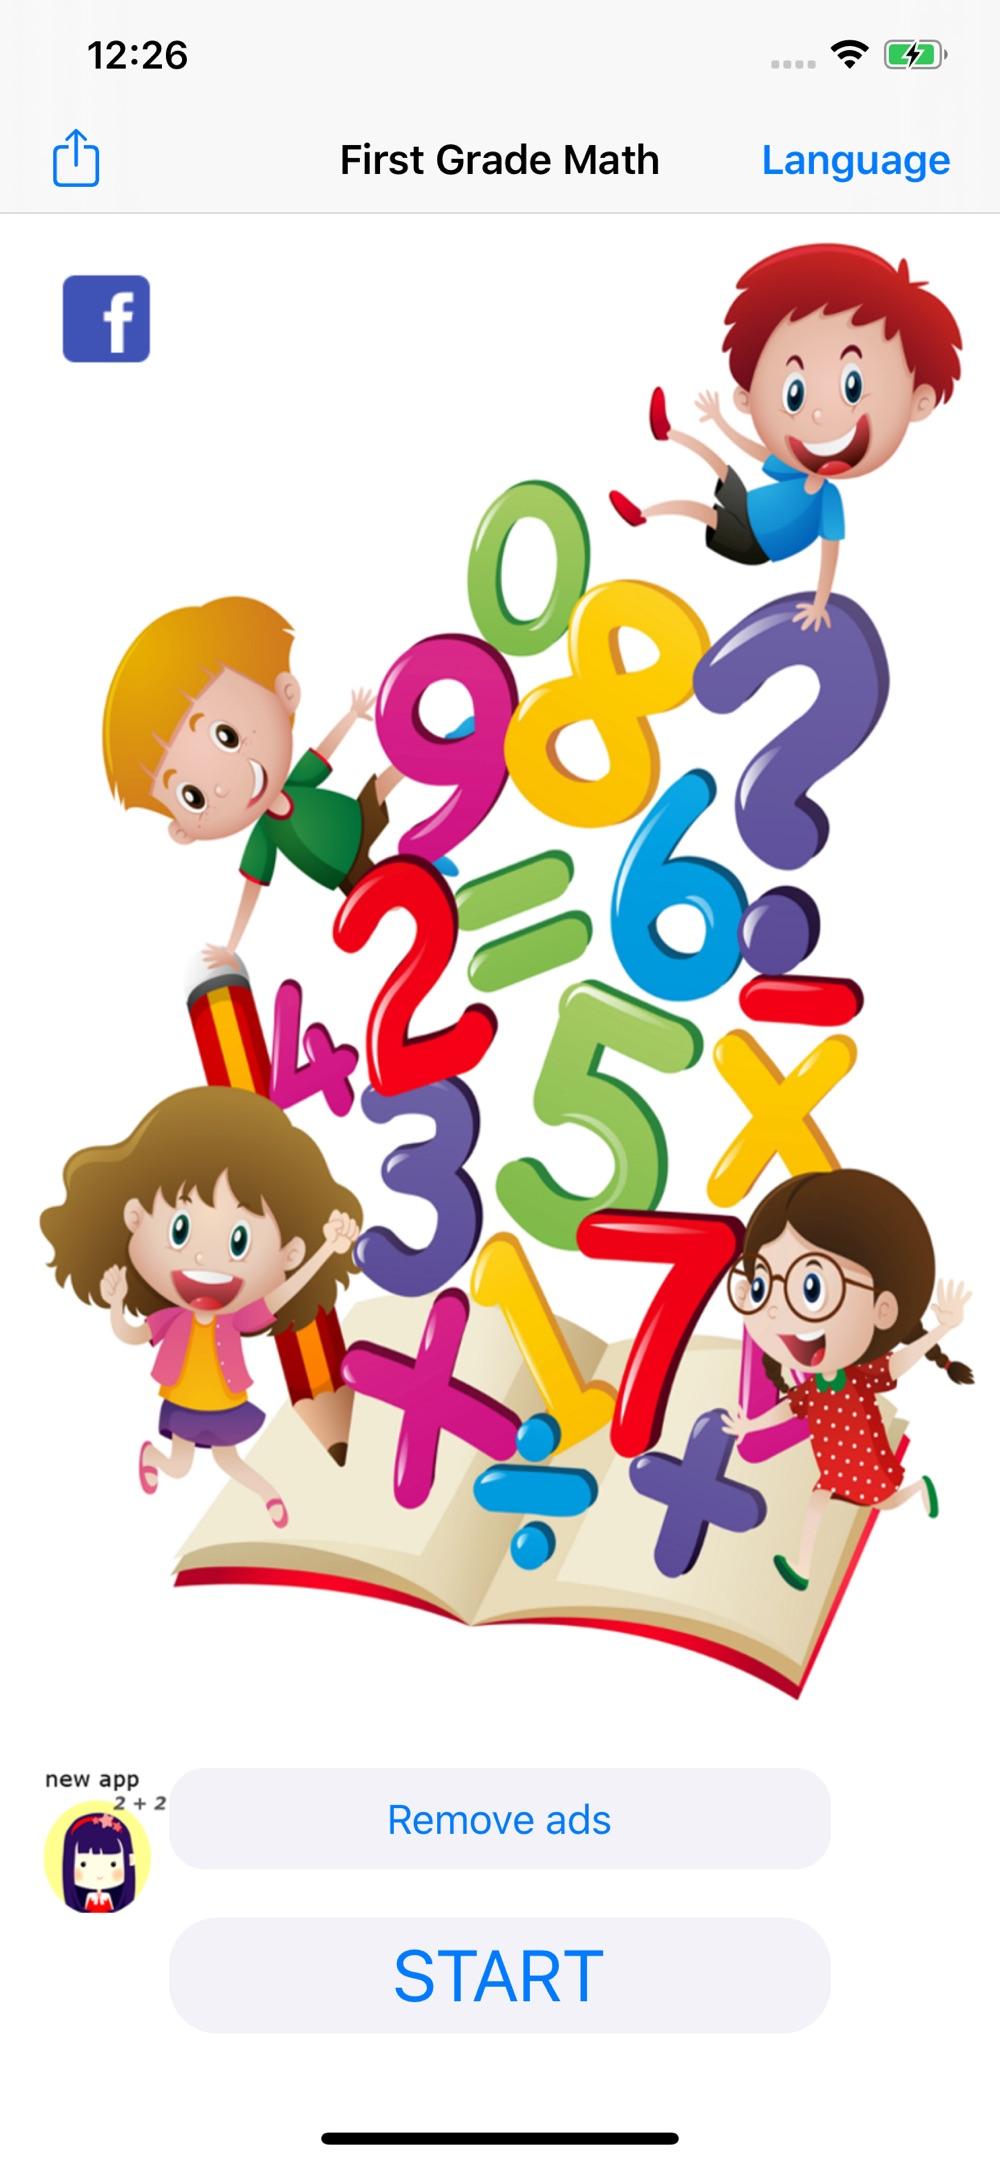 First Grade Math Quiz Cheat Codes